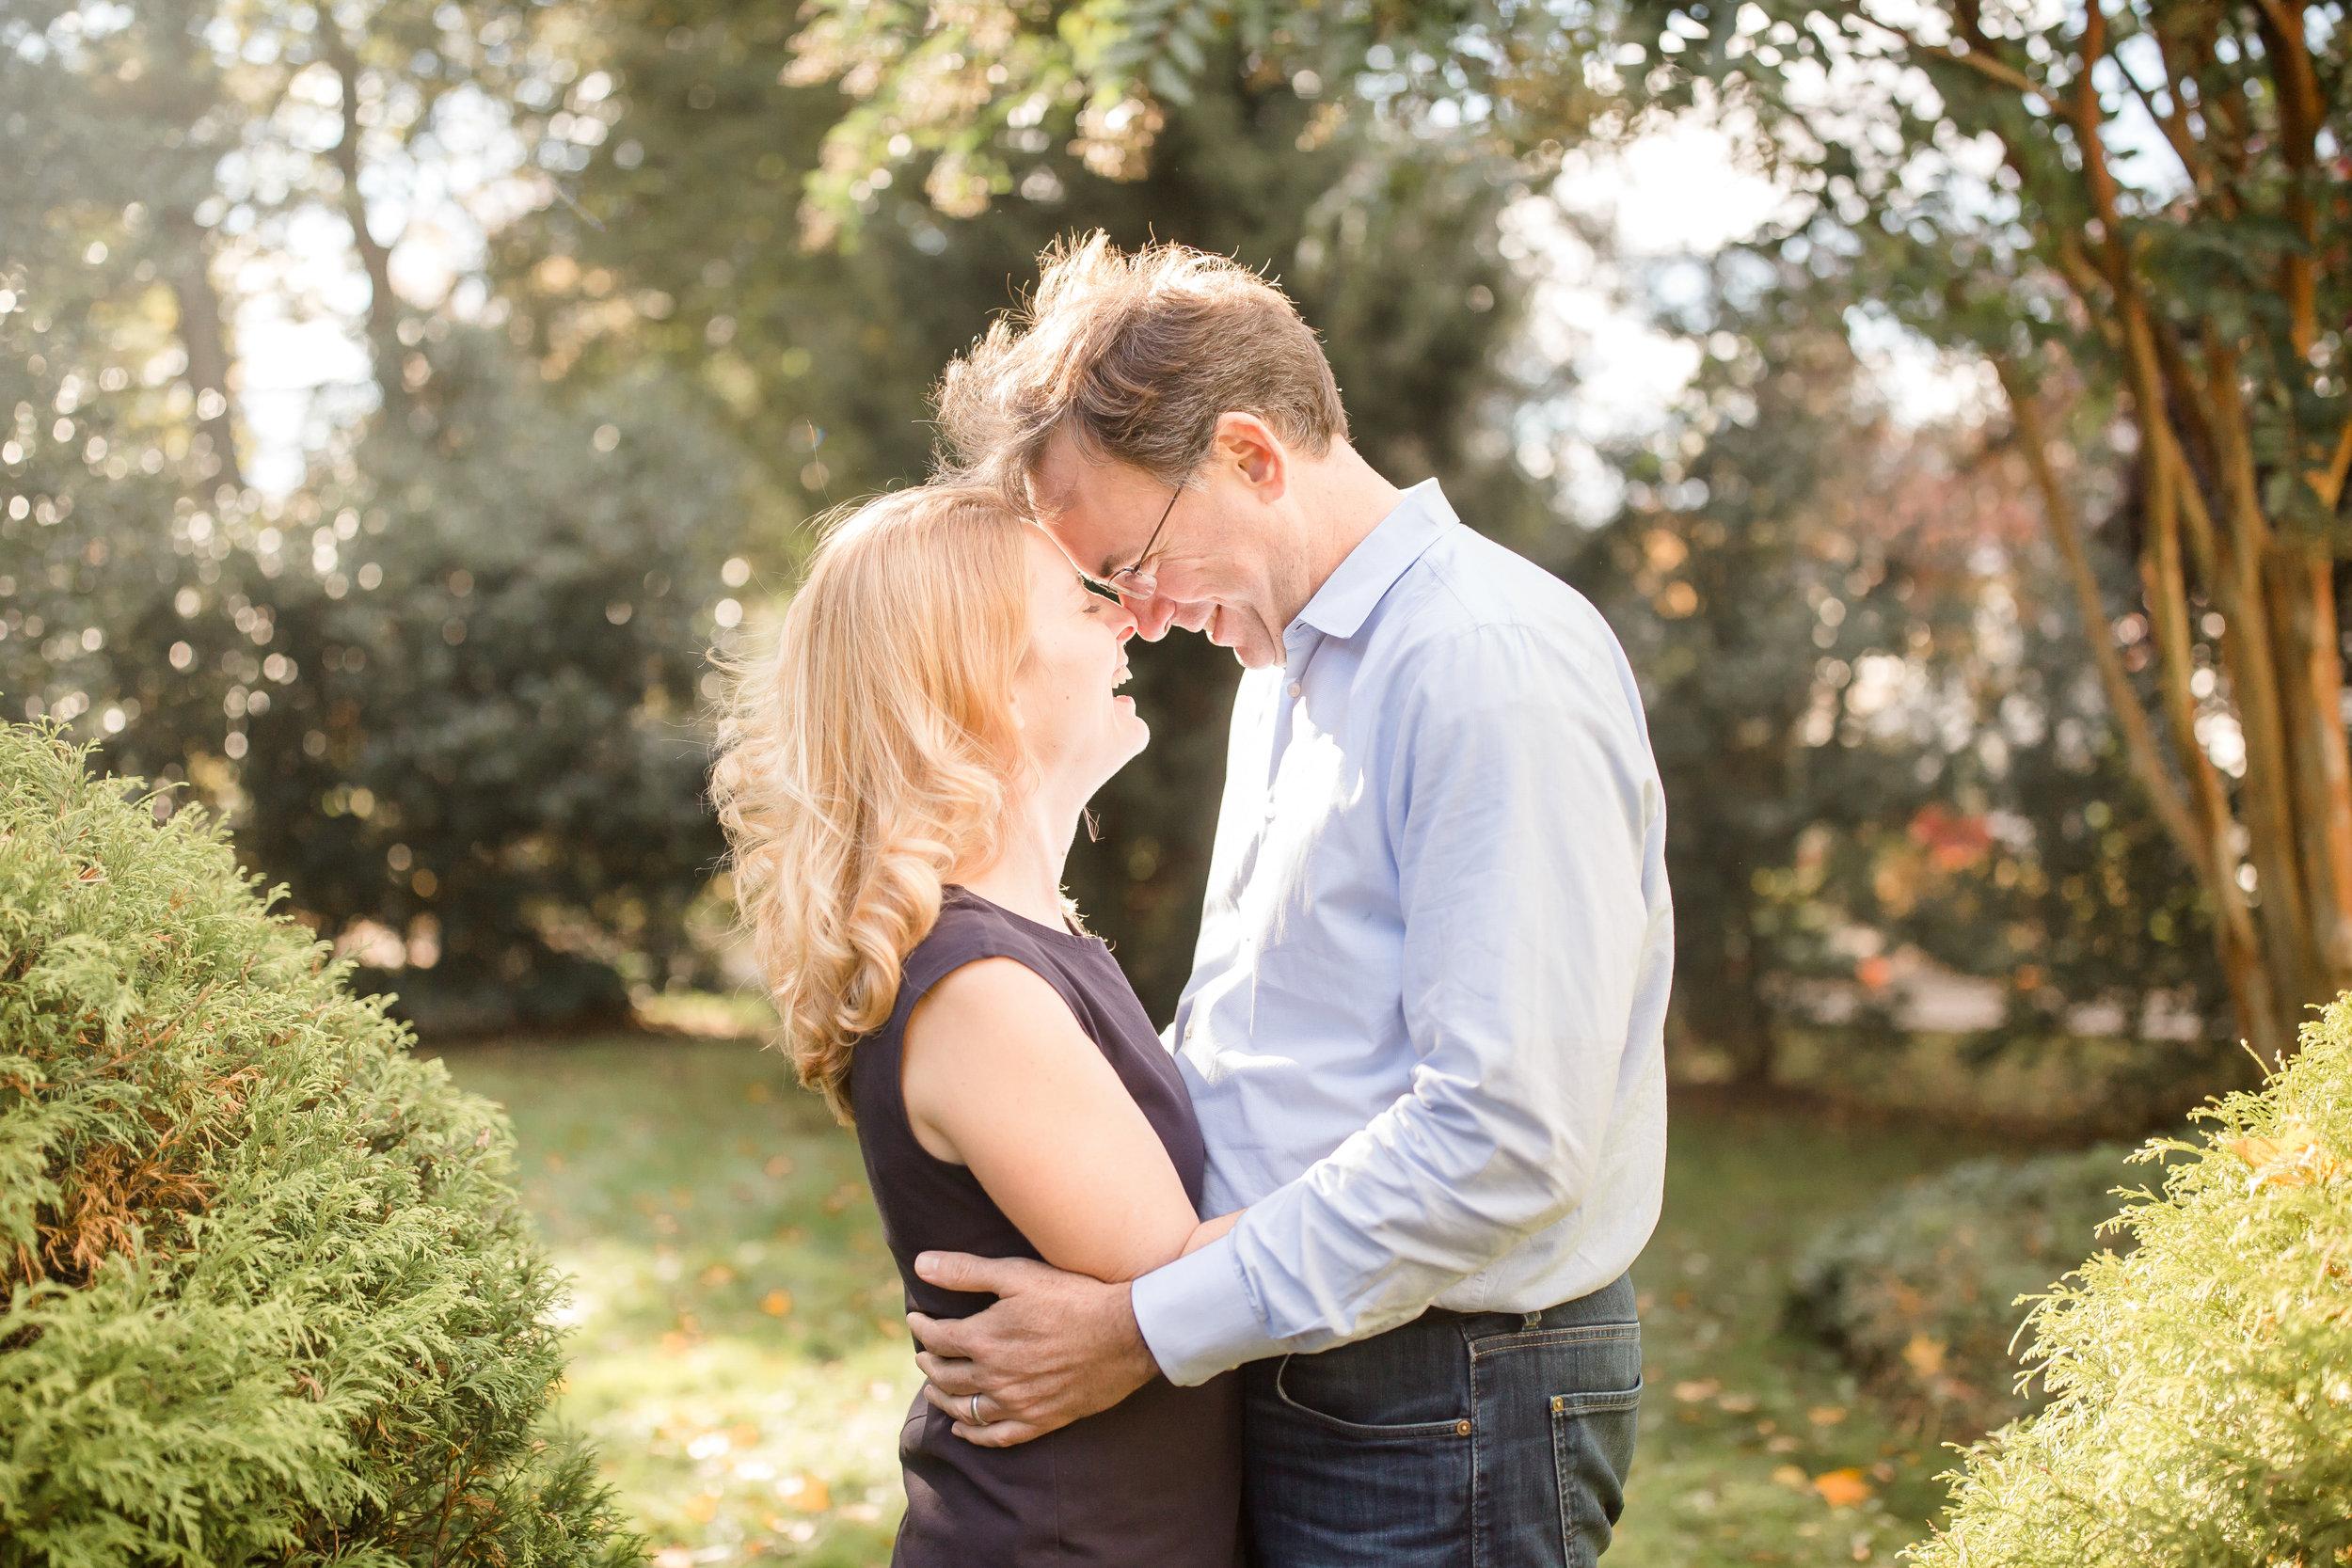 Author, Laura Vanderkam and her husband. Photo credit: Yana Shellman